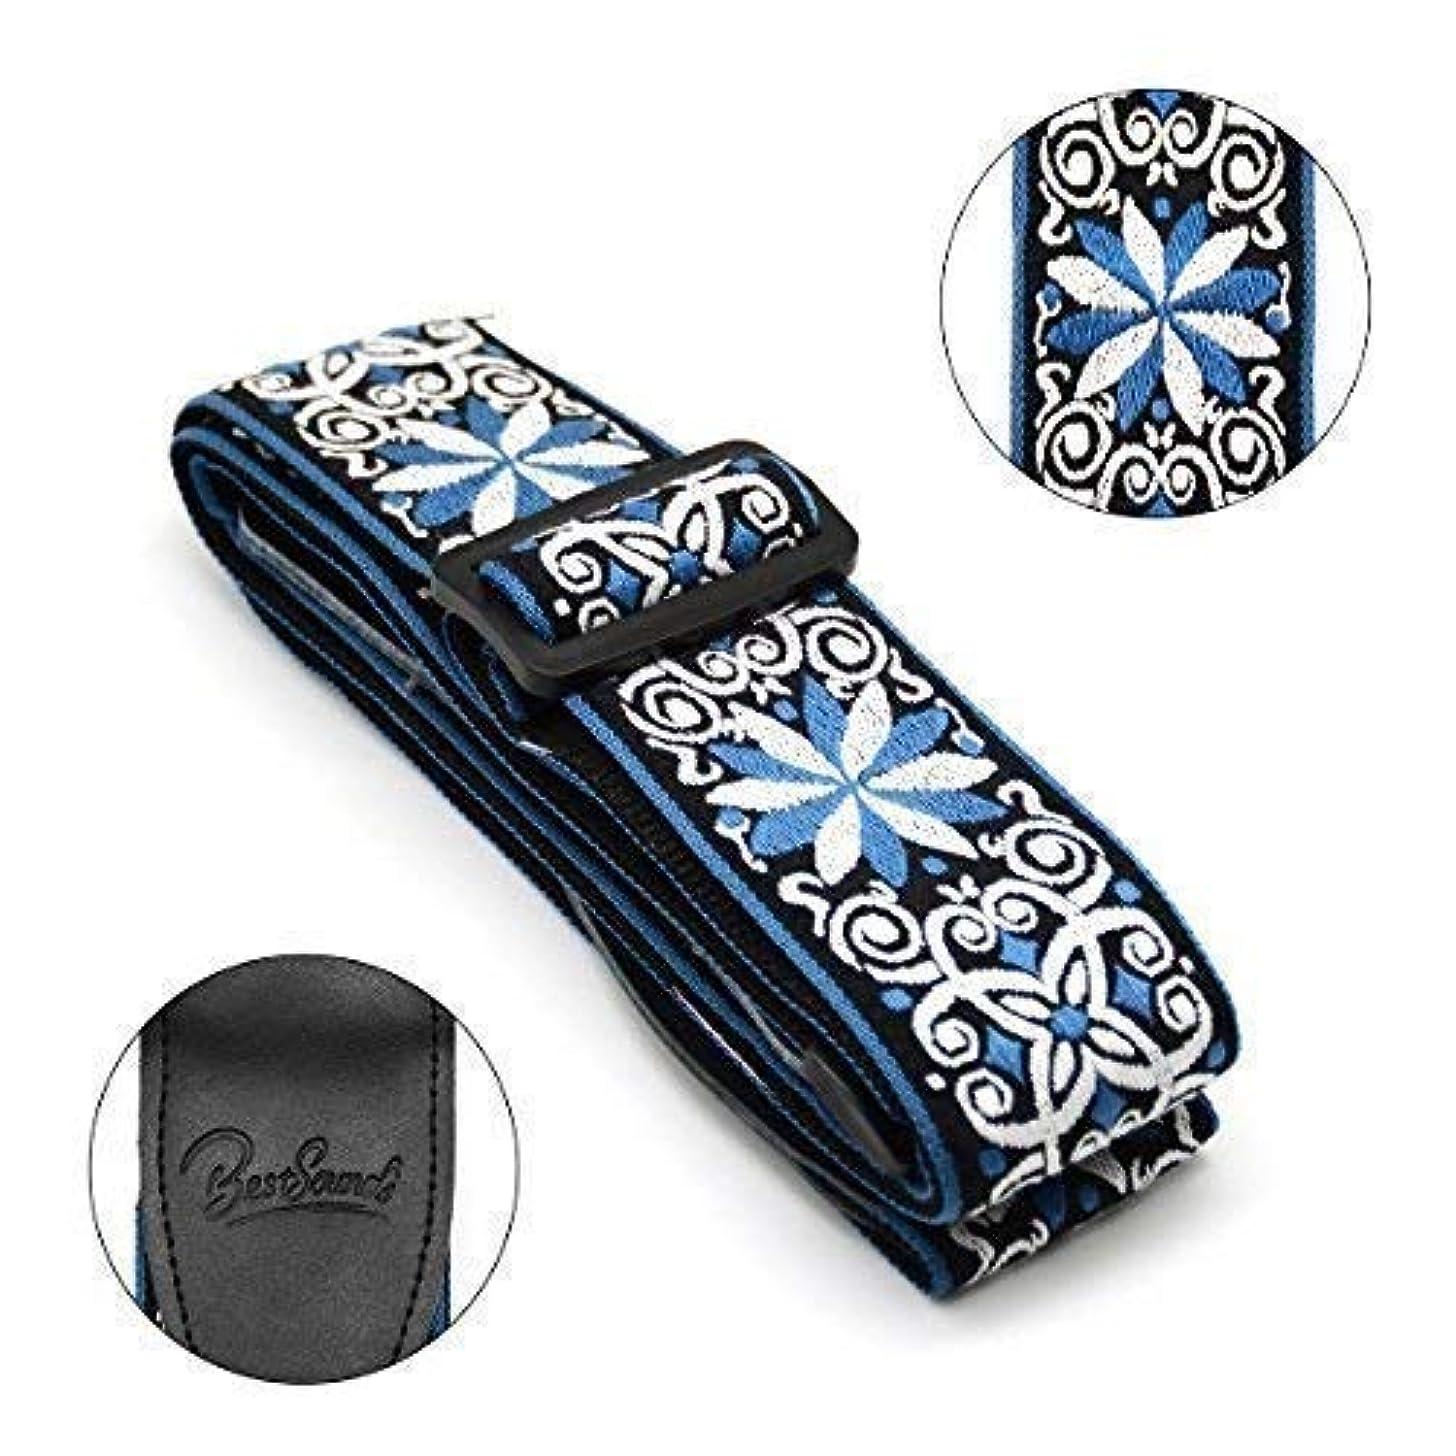 Guitar Strap Vintage Hootenanny Jacquard Weave & Genuine Leather End Suitable for Bass, Electric,Acoustic Guitars (Blue)